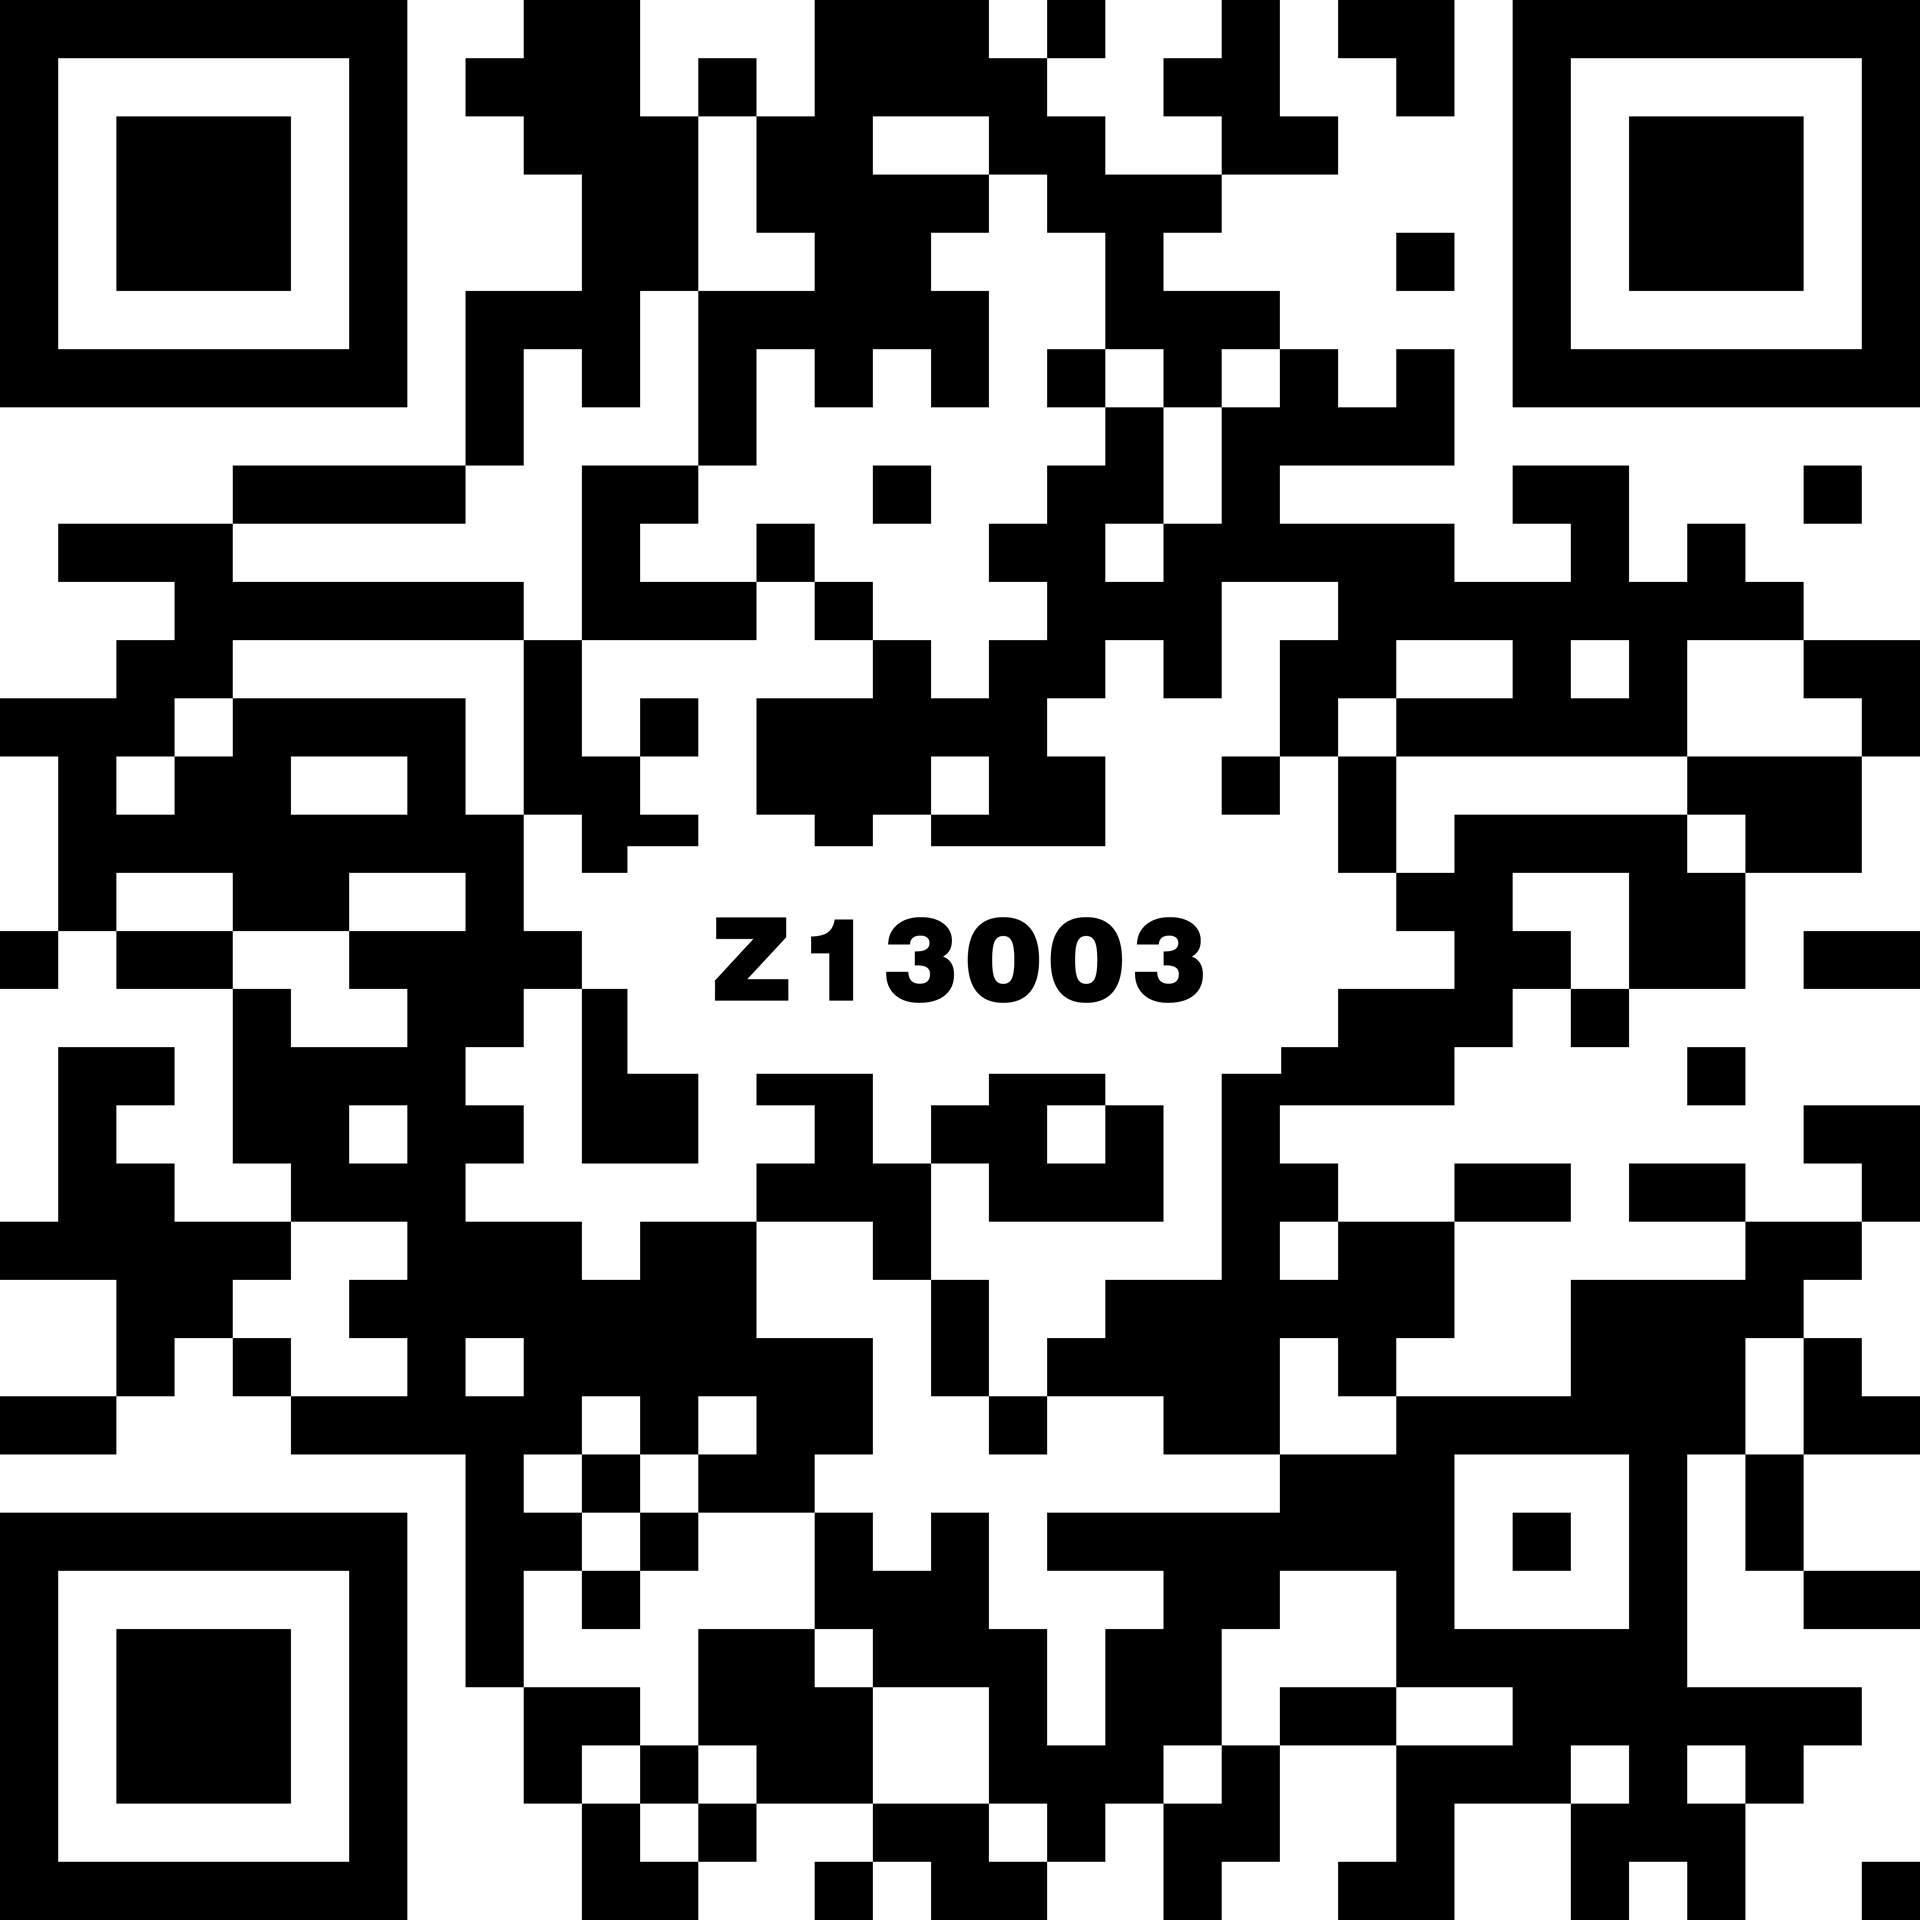 Z13003